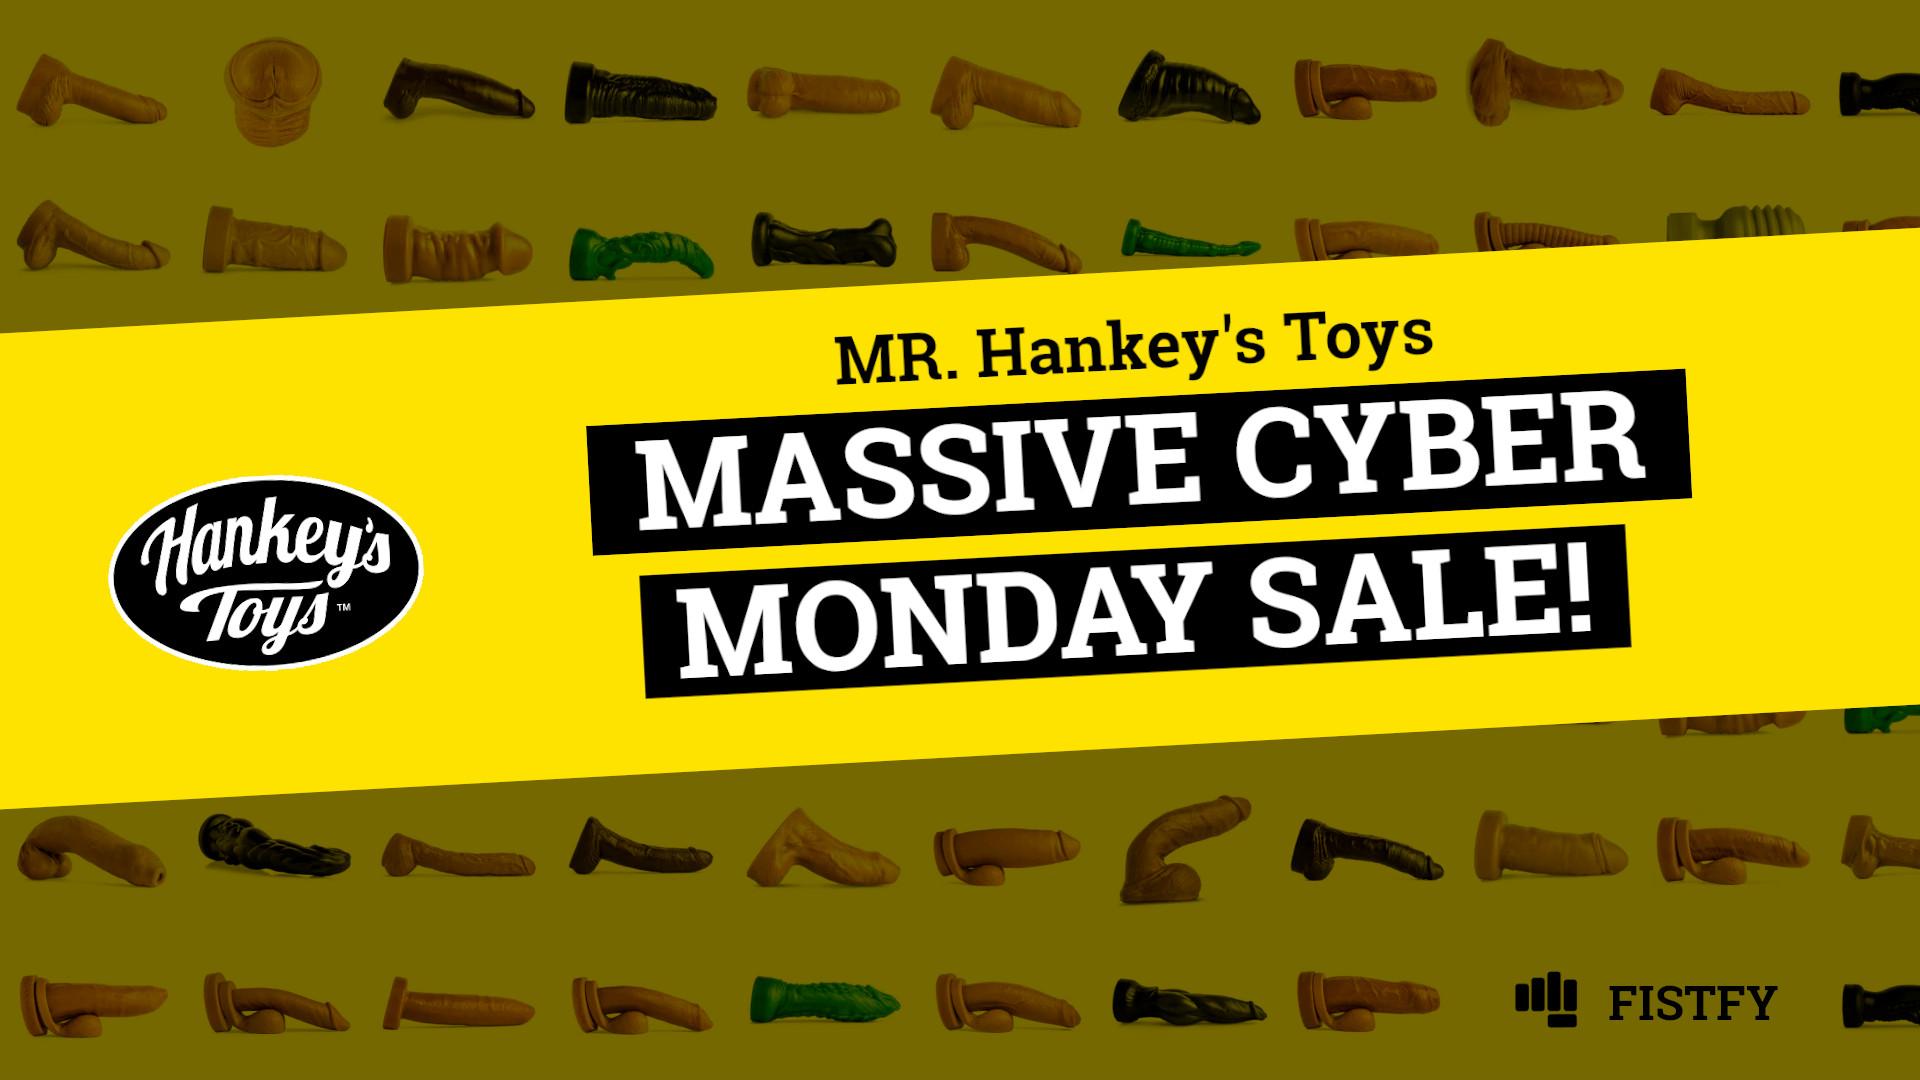 Mr. Hankey's Toys Cyber Monday sale